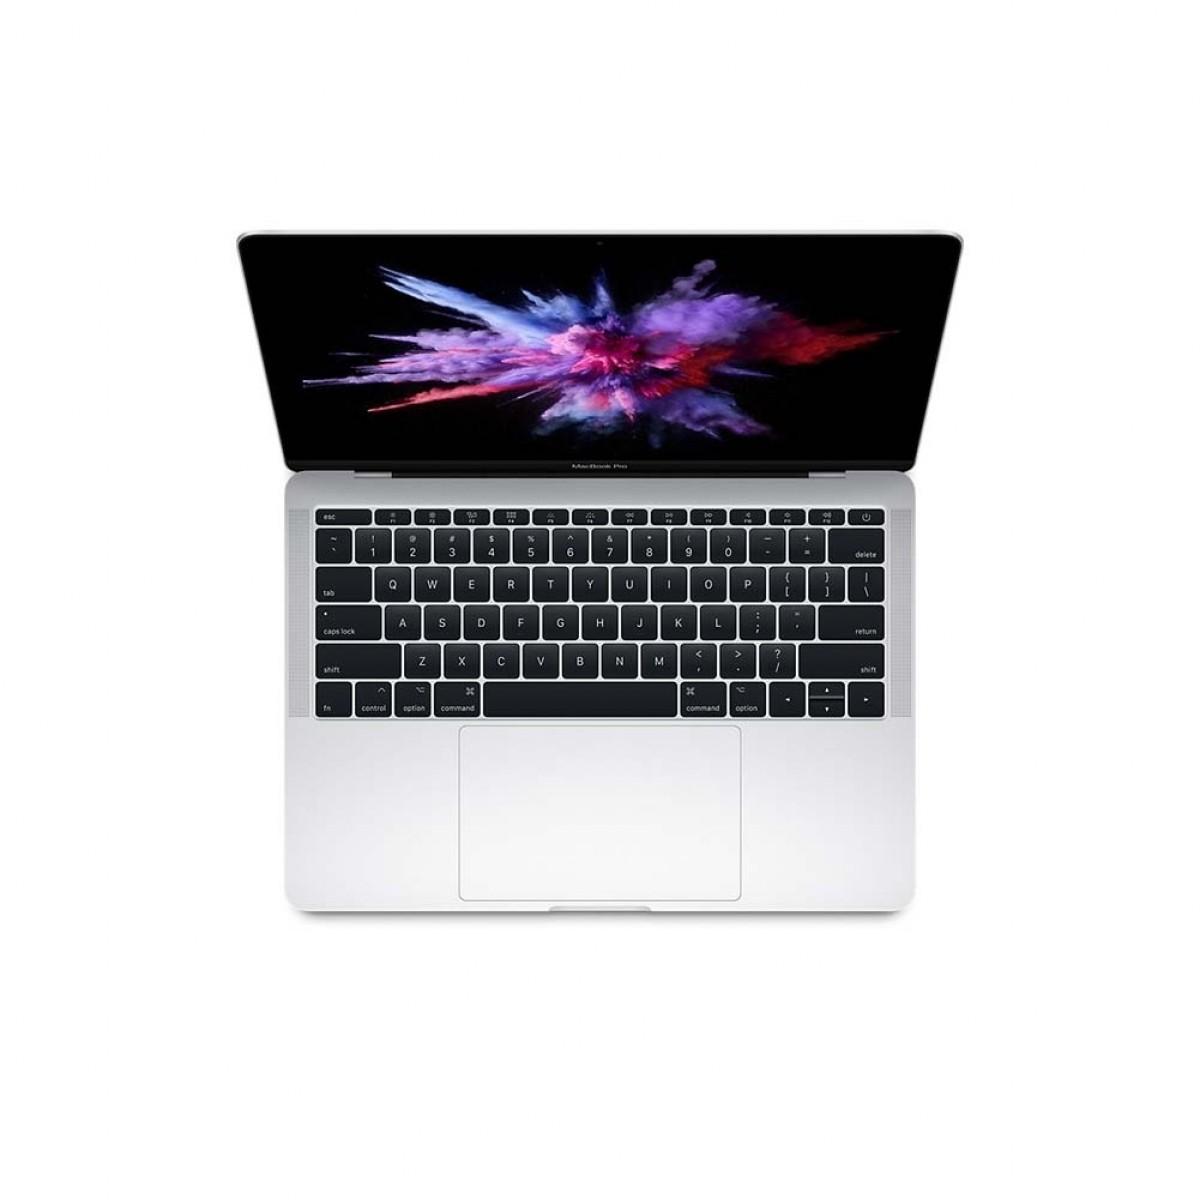 MacBook Pro 13″(2016) 2.0ghz i5/8gb/256gb SSD Silver